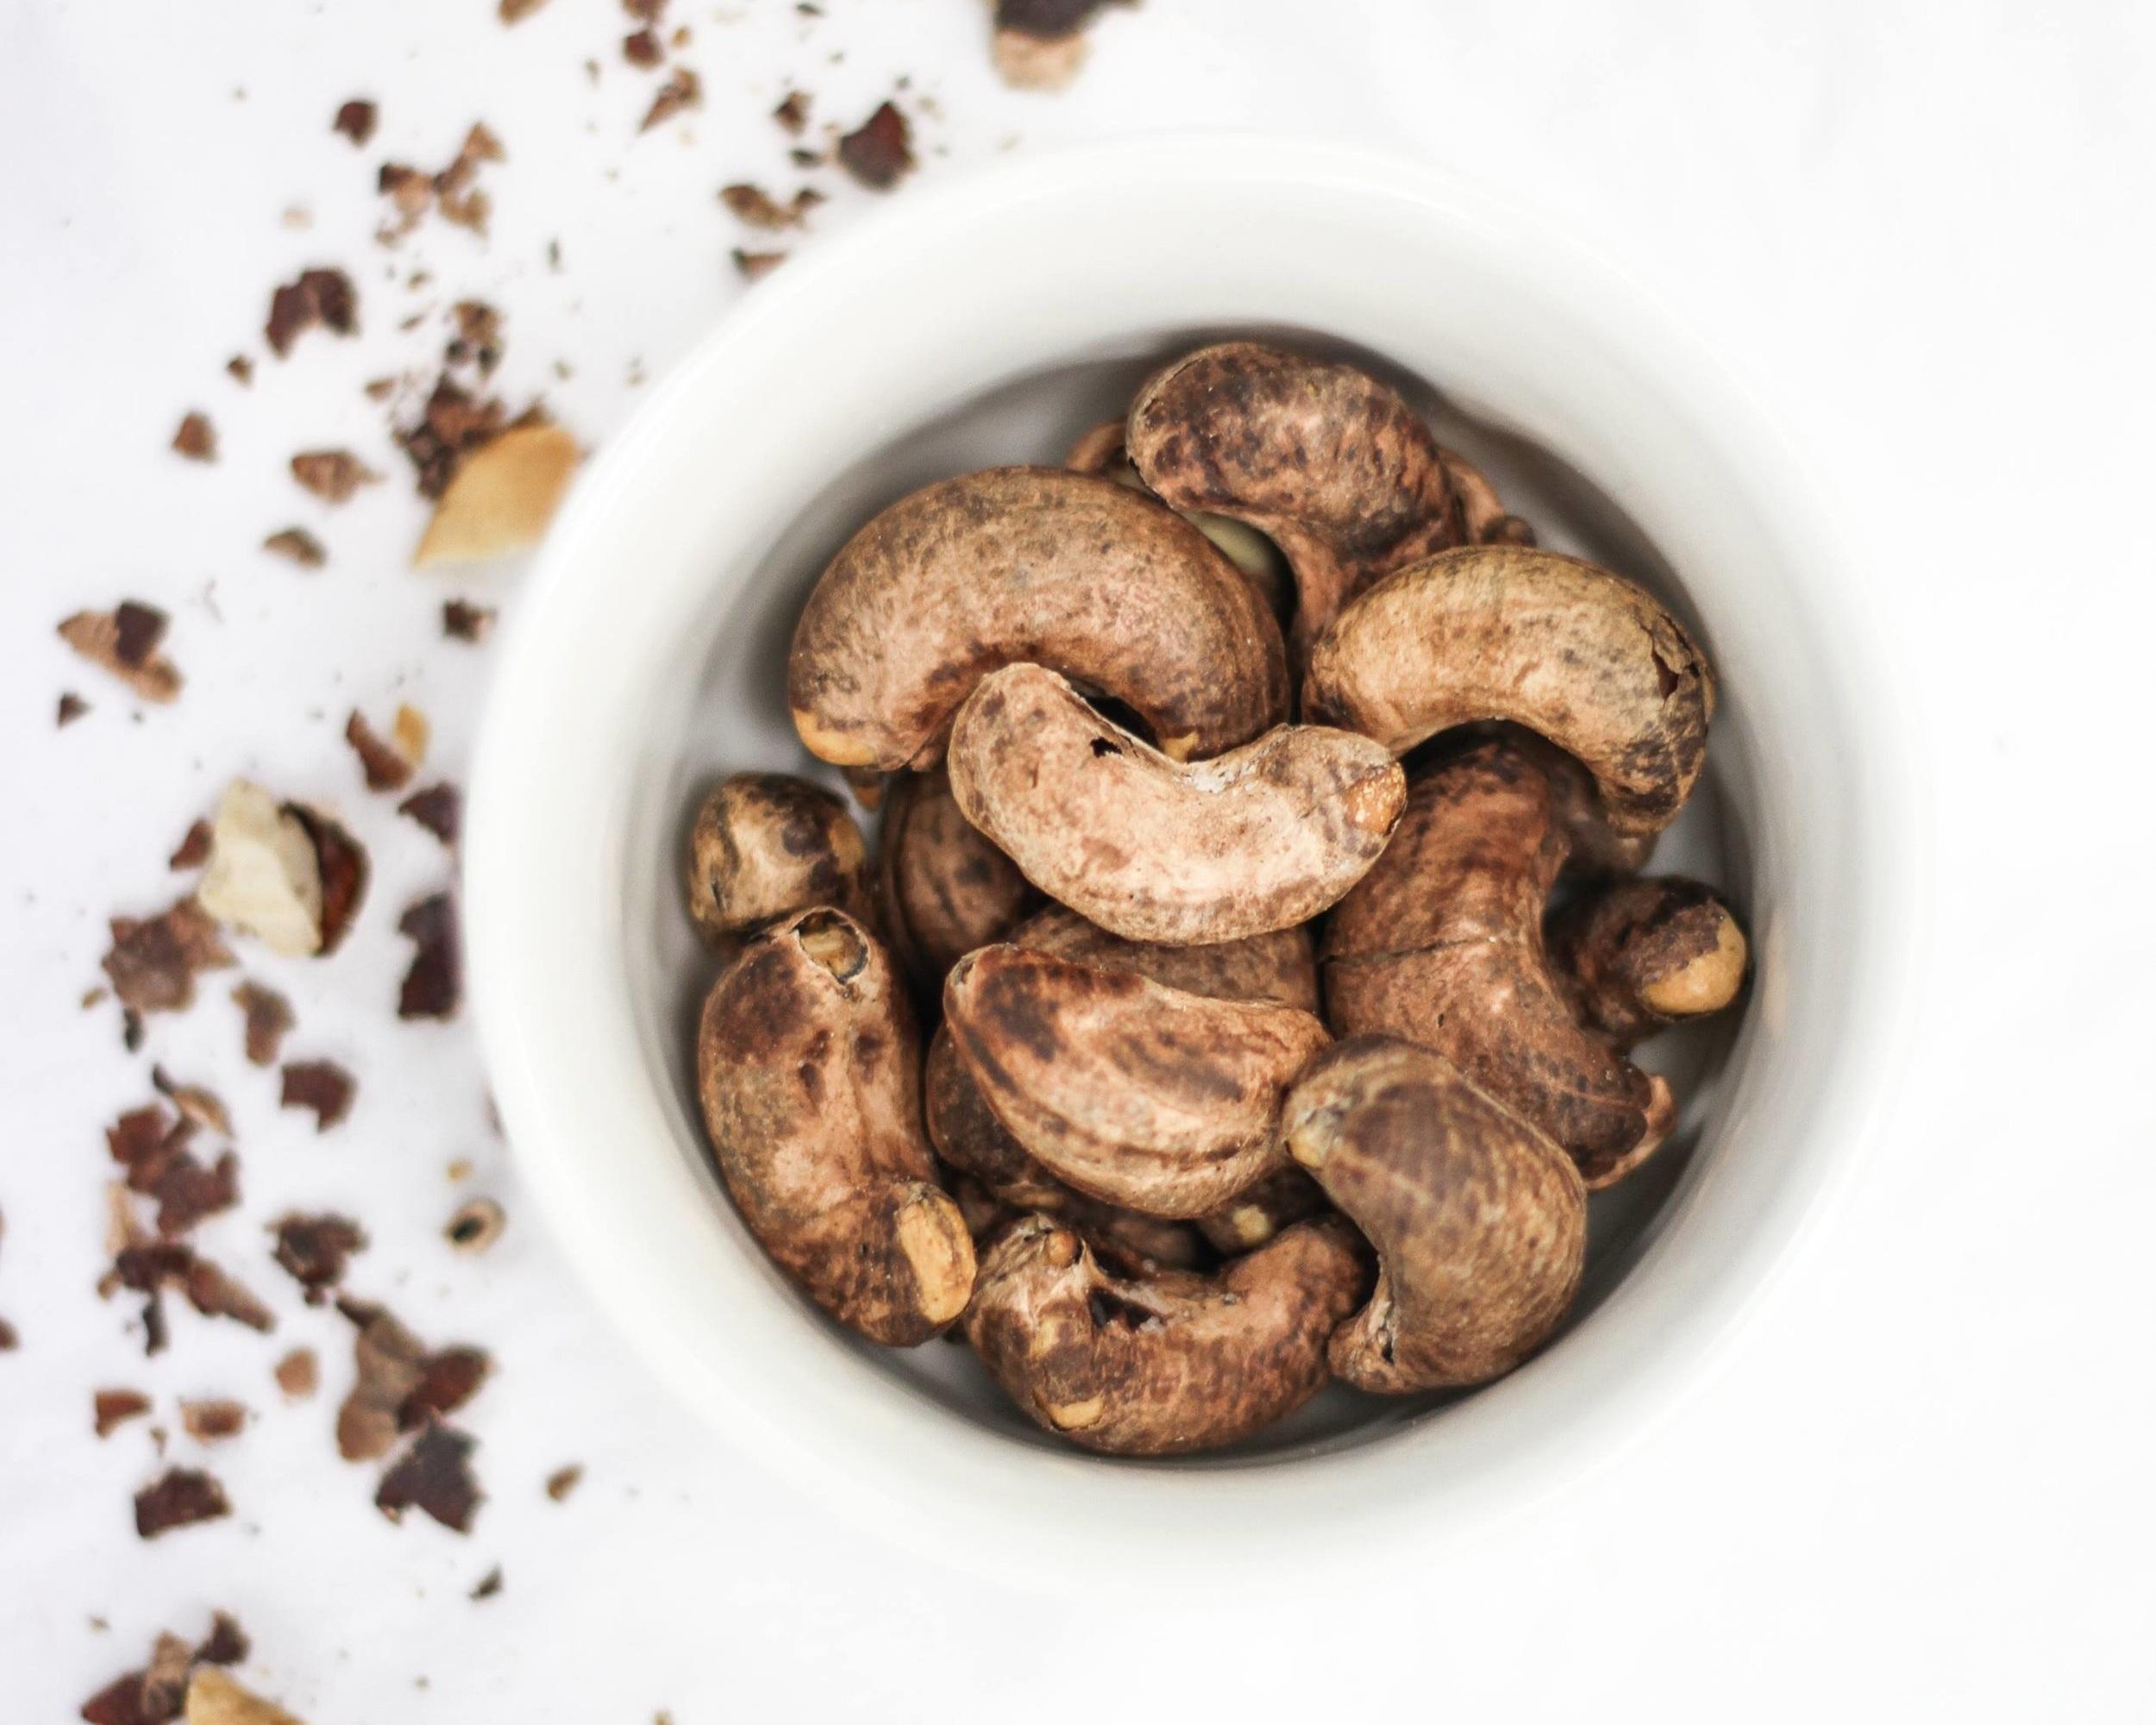 hayley-roberts-cashews.jpg